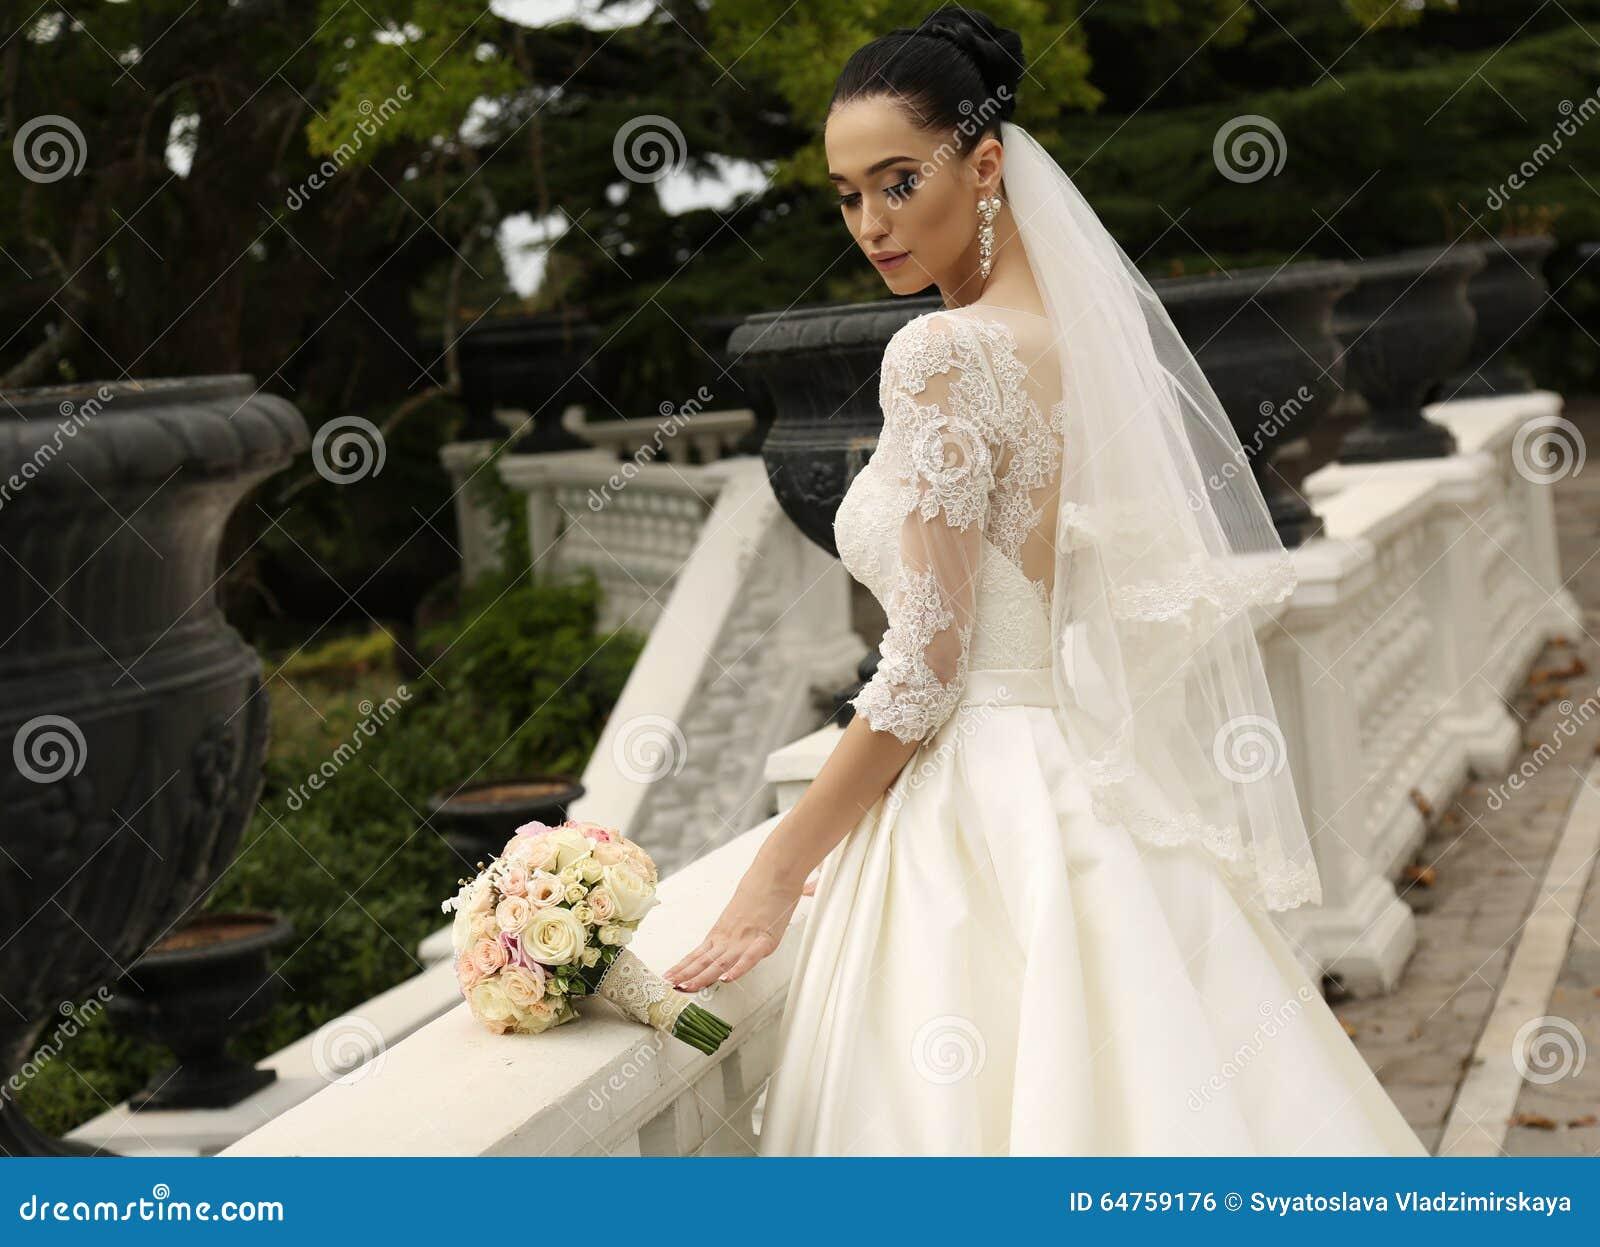 Gorgeous Bride With Dark Hair Wears Elegant Wedding Dress